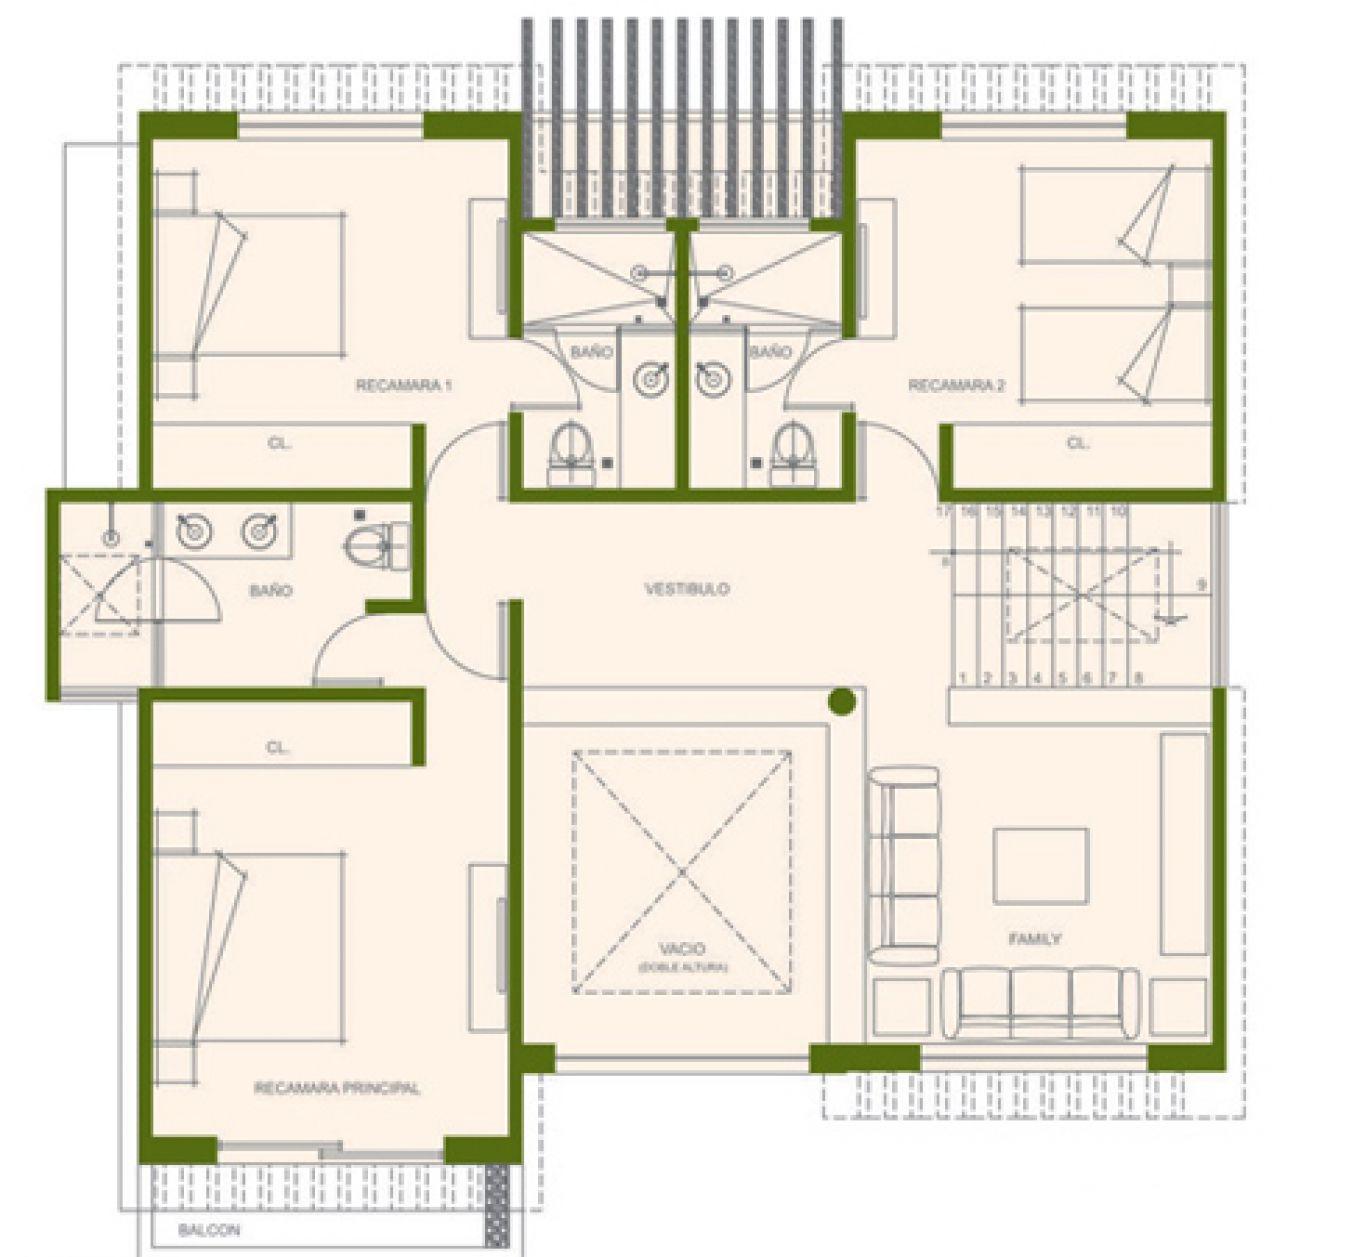 Residencial paraíso country club, id 1525184, no 2, plano de albatross, 403